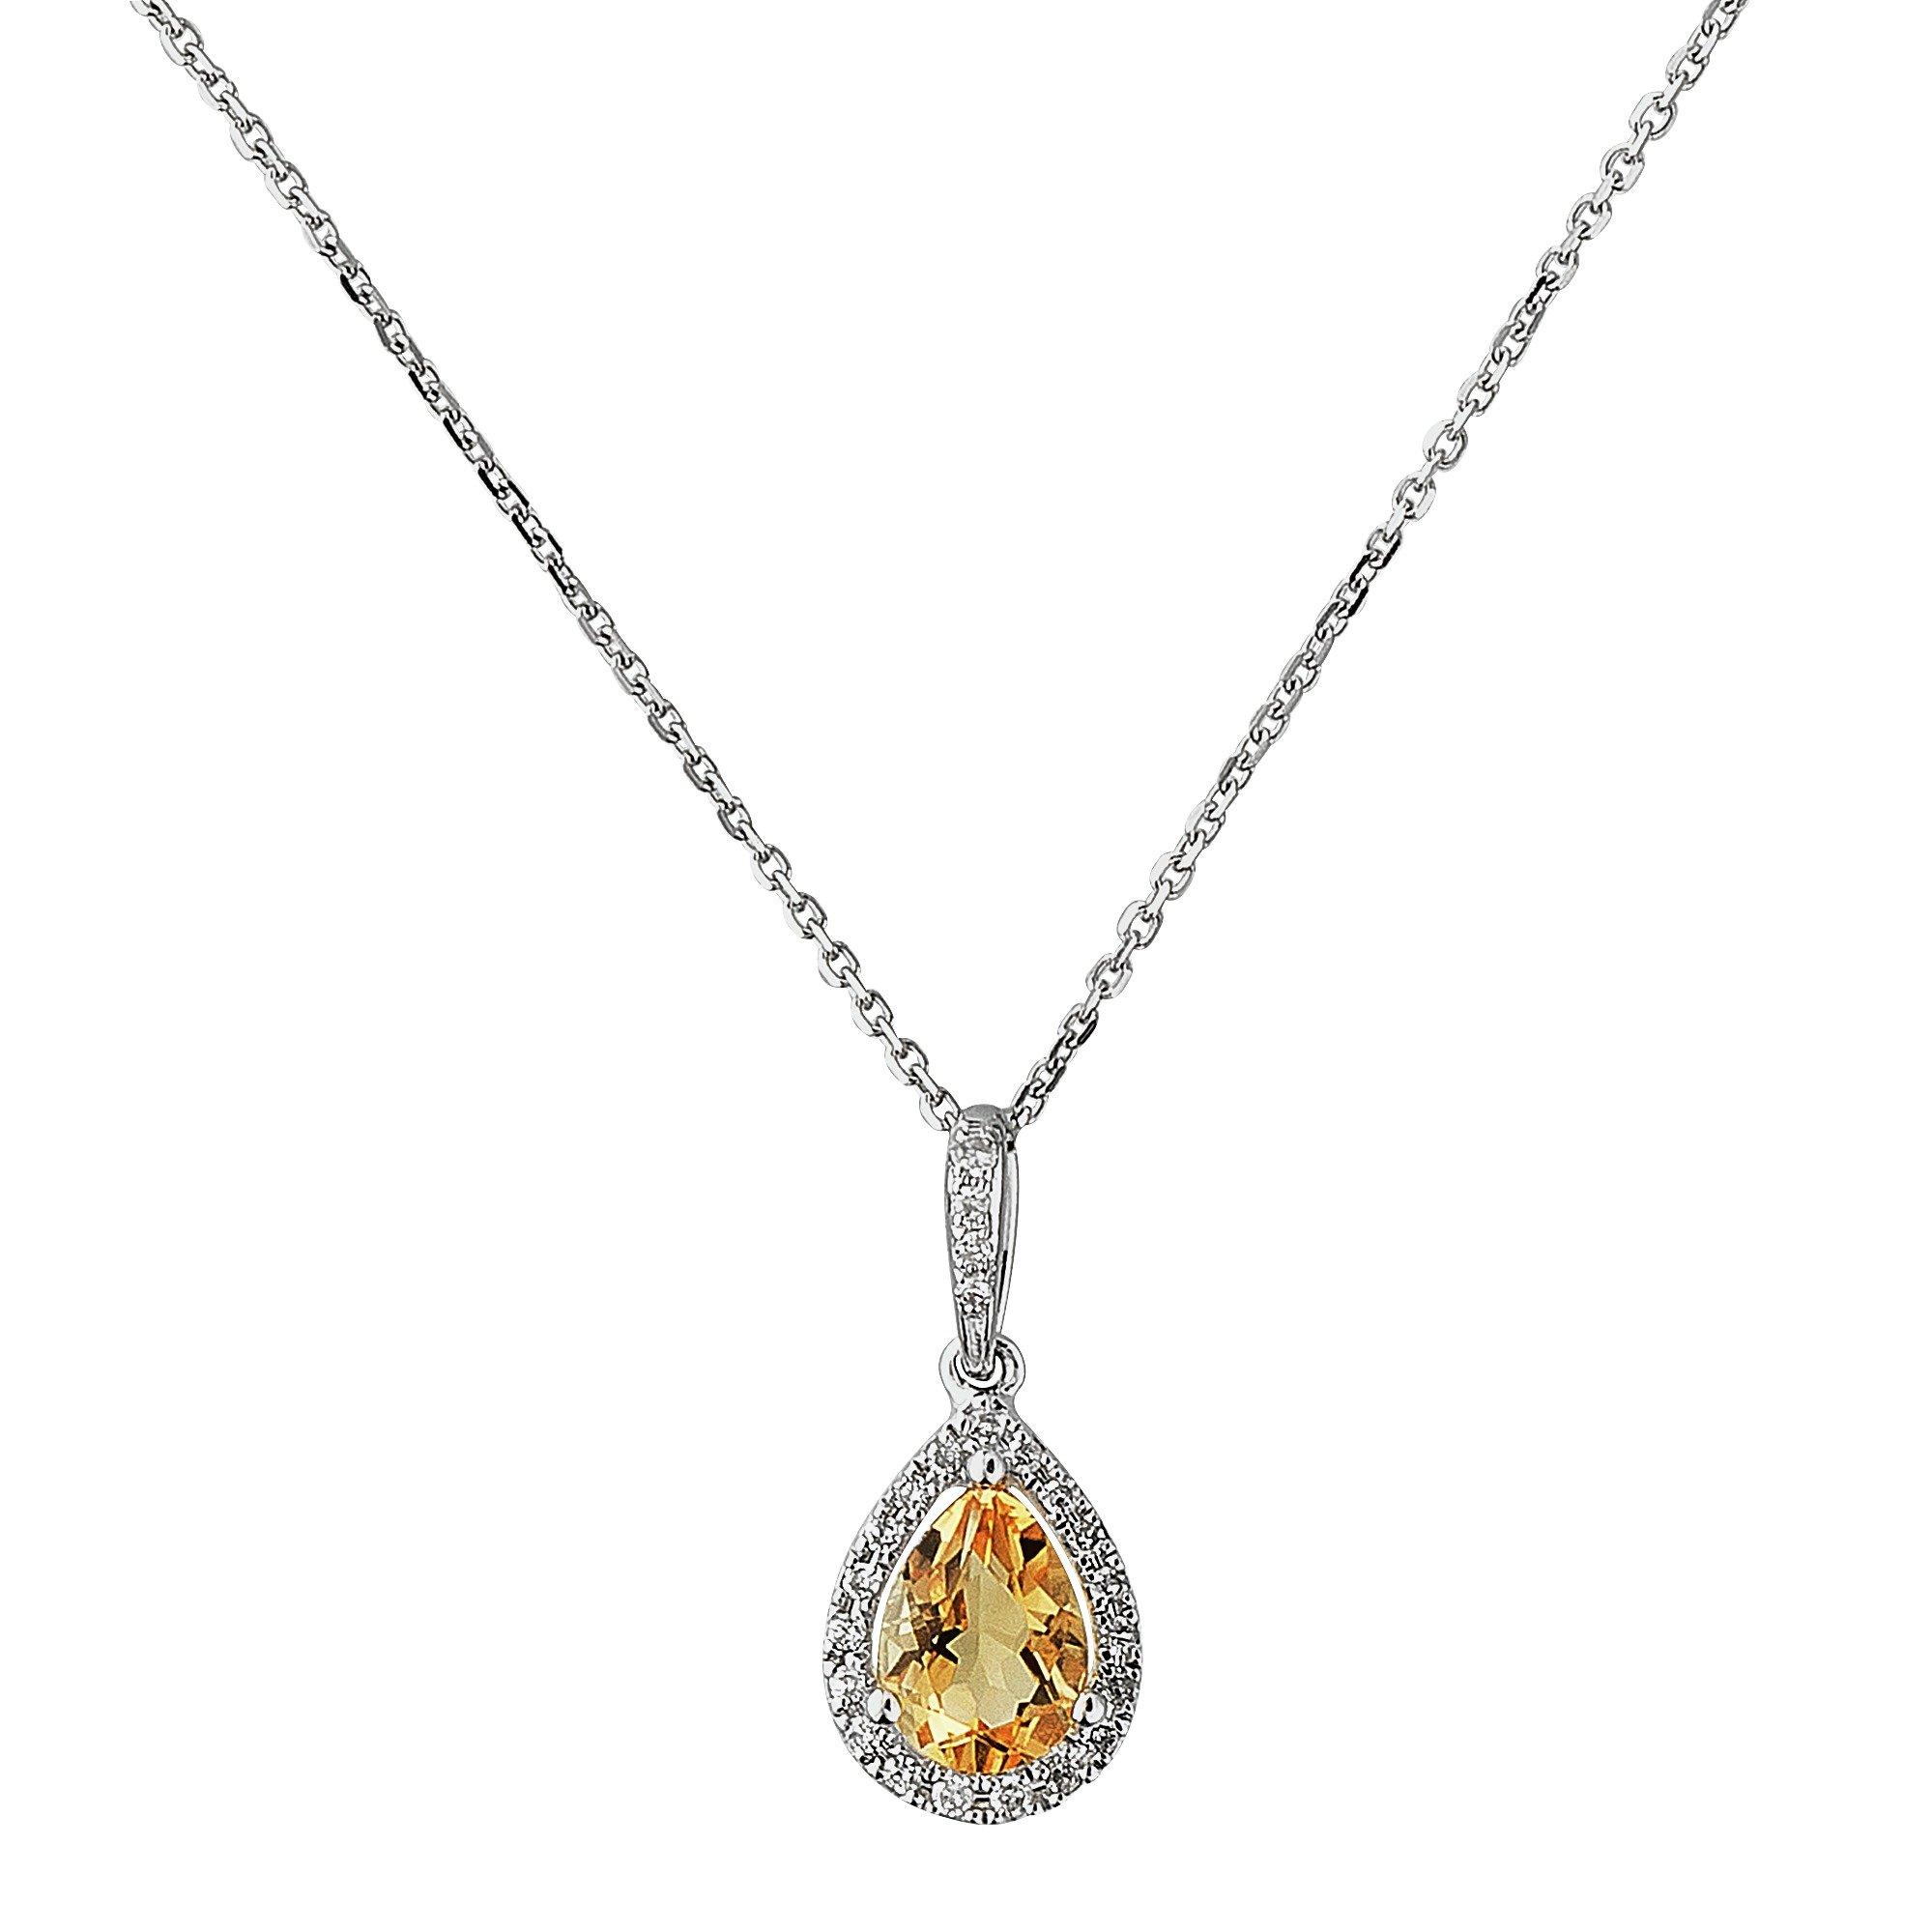 Revere 9ct White Gold Citrine and 0.08ct Diamond Pendant